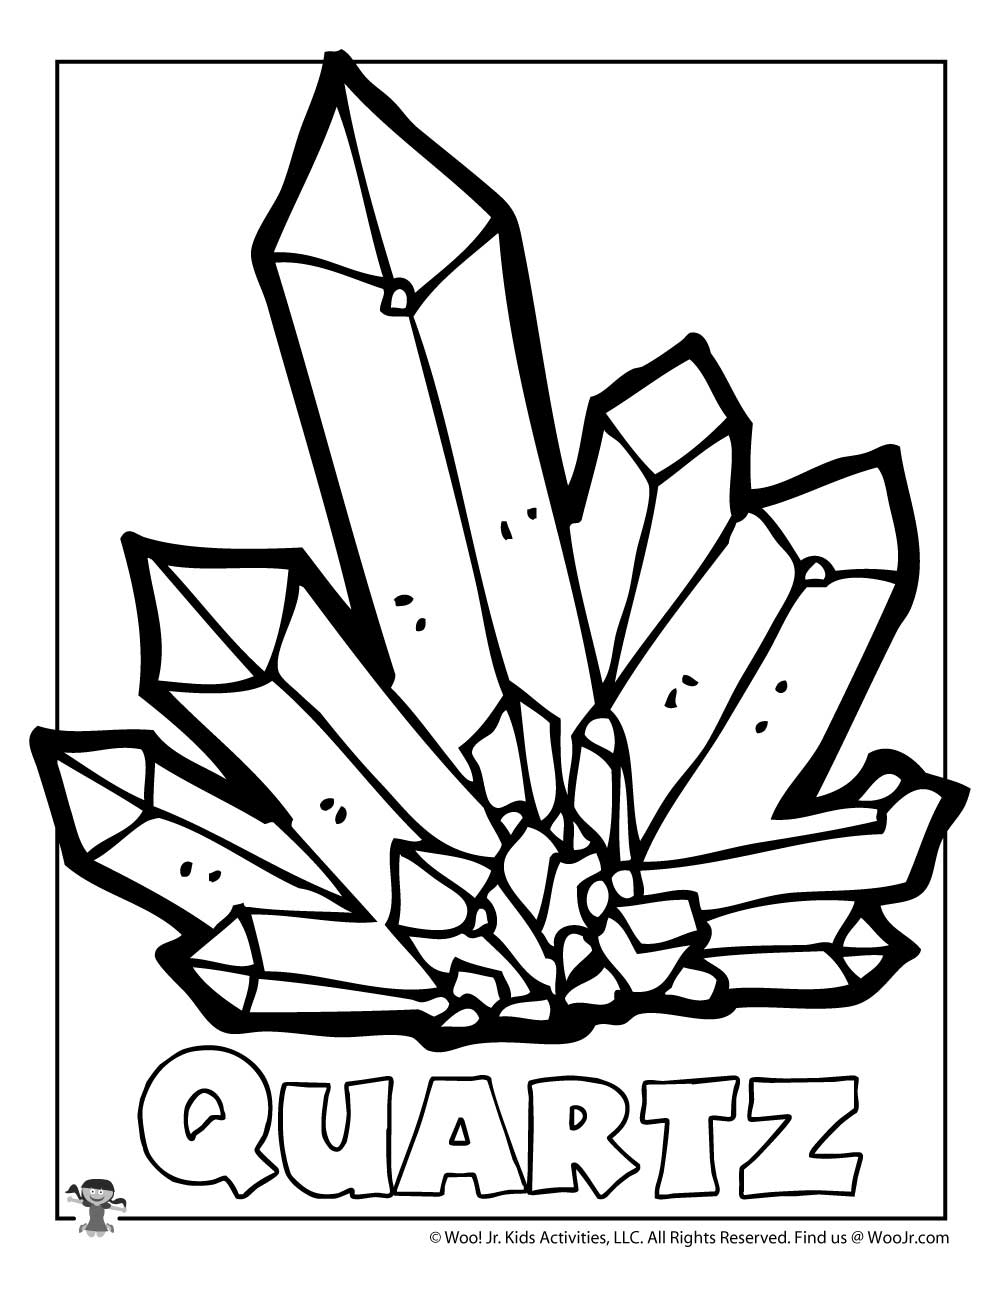 Q is for Quartz Coloring Page | Woo! Jr. Kids Activities